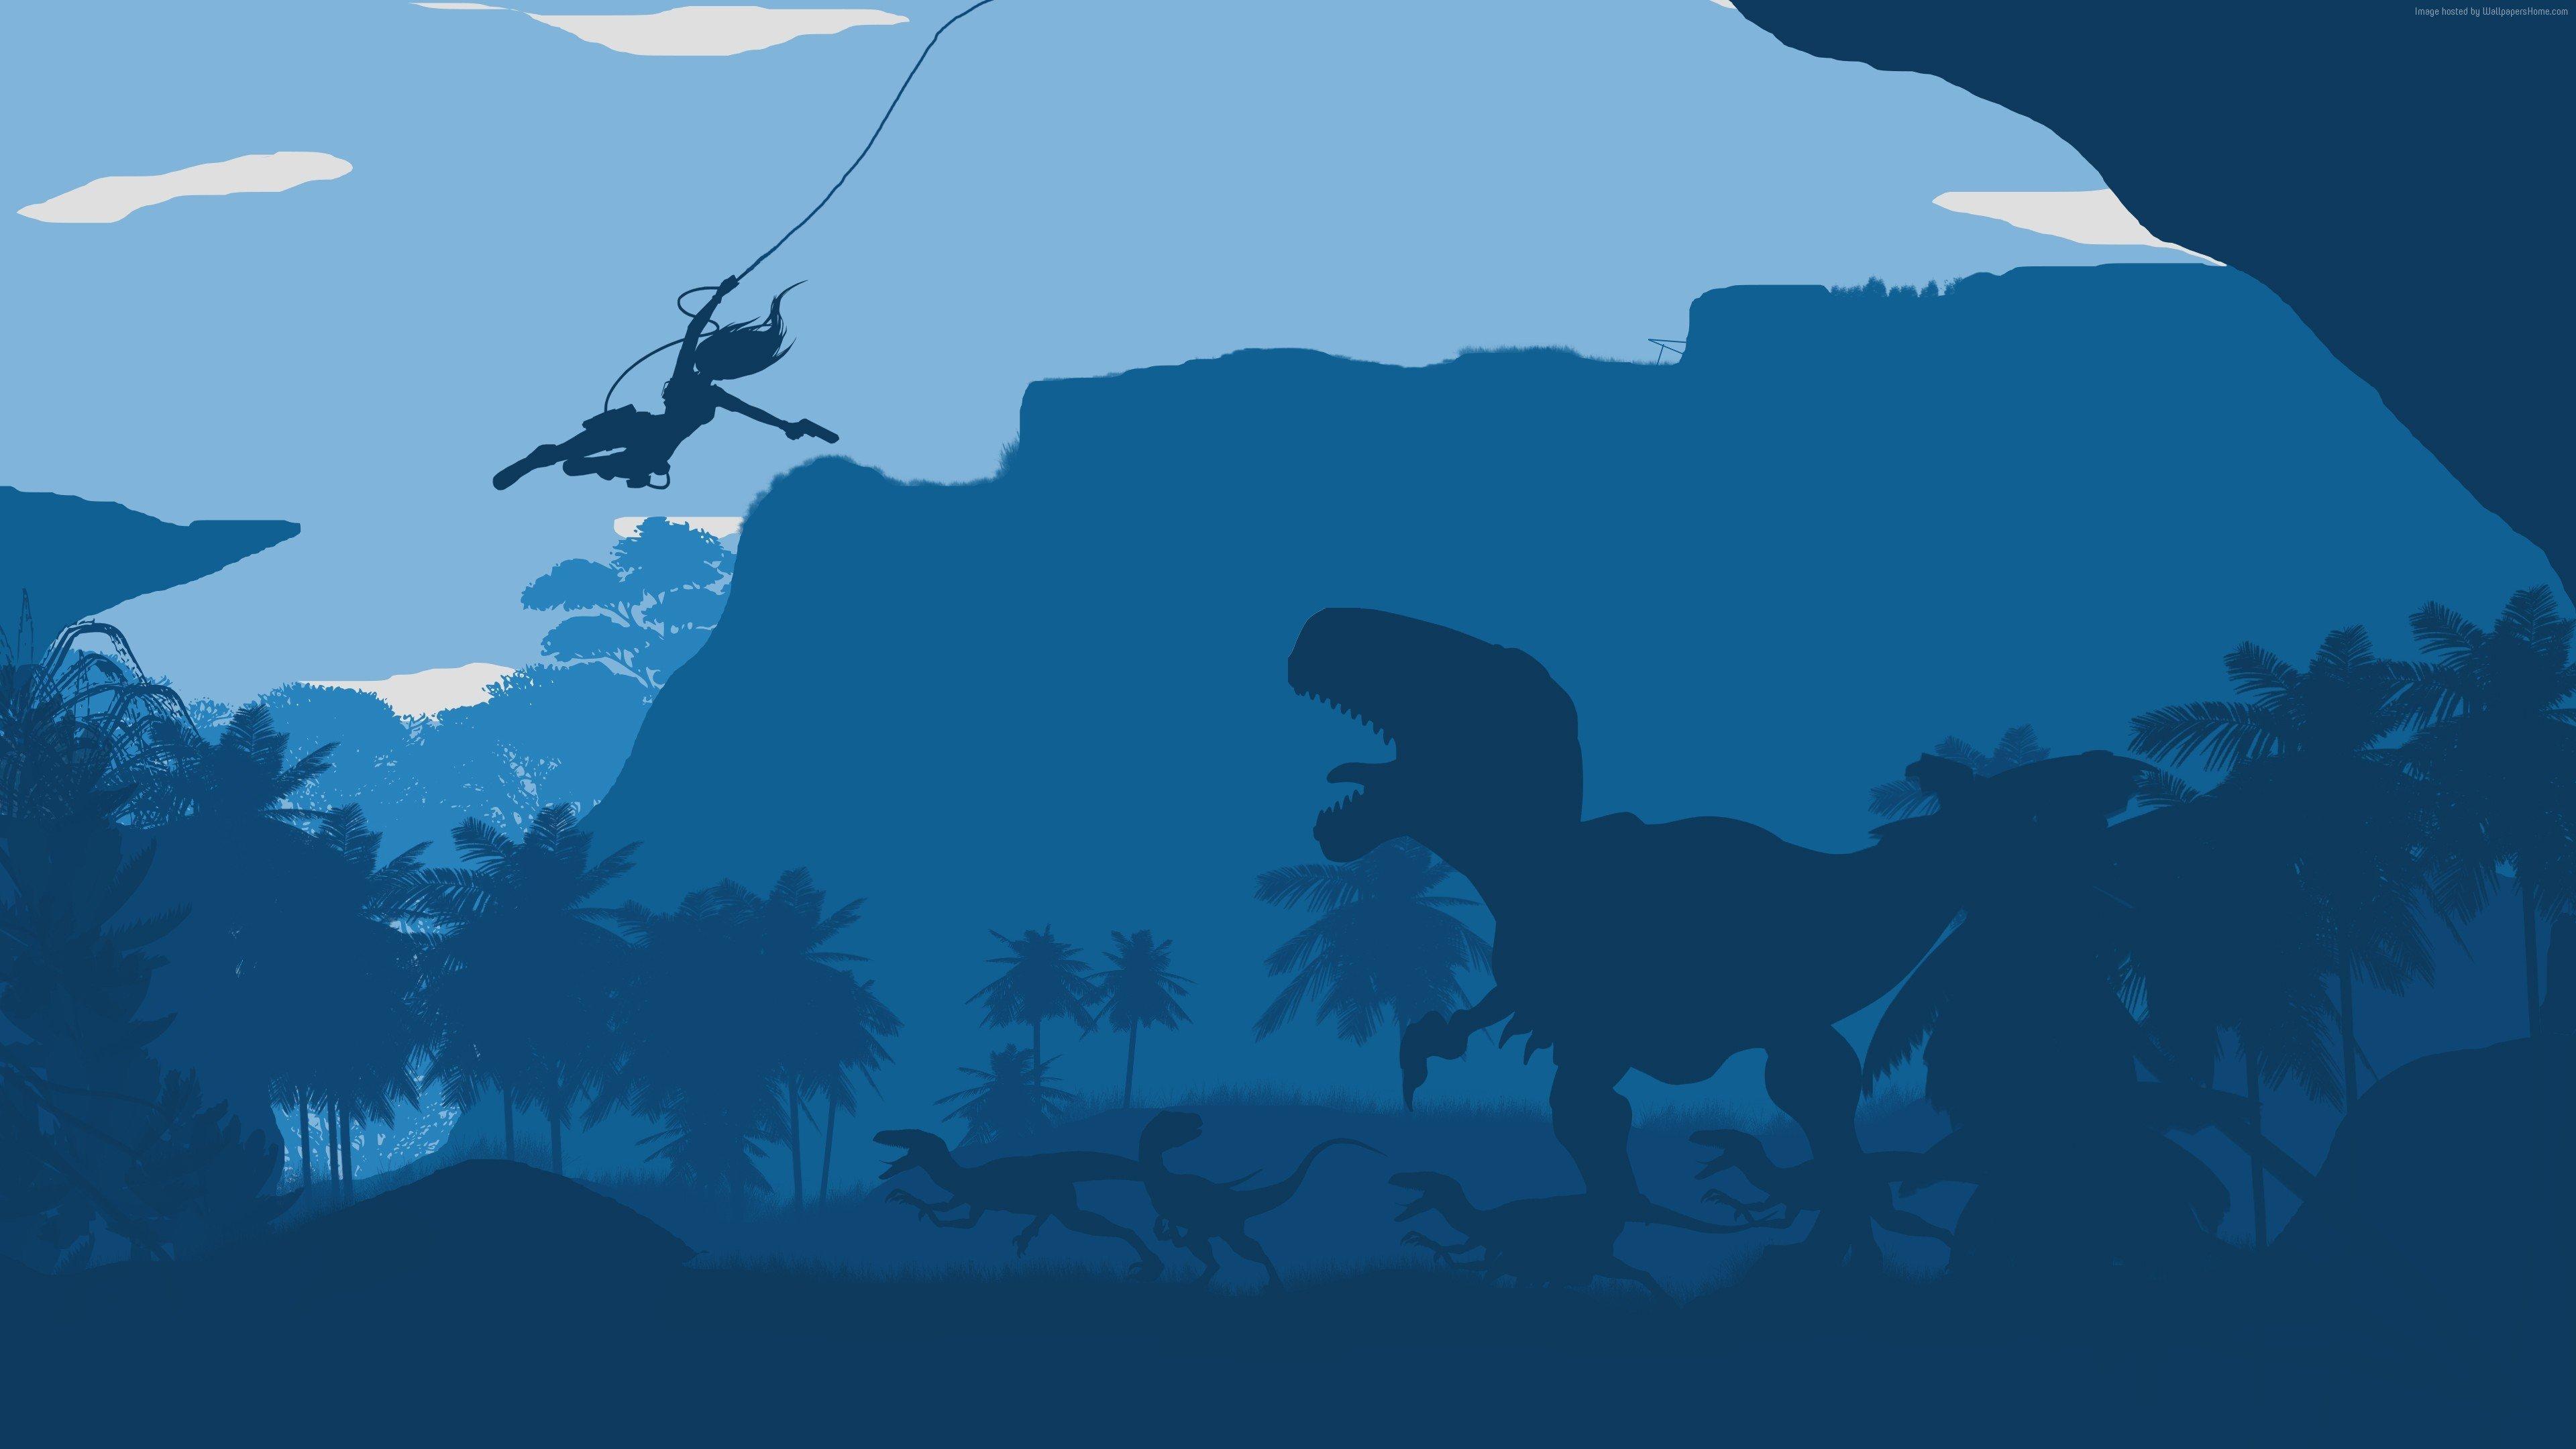 Wallpaper 3840x2160 Px Flatdesign Symbols Tomb Raider